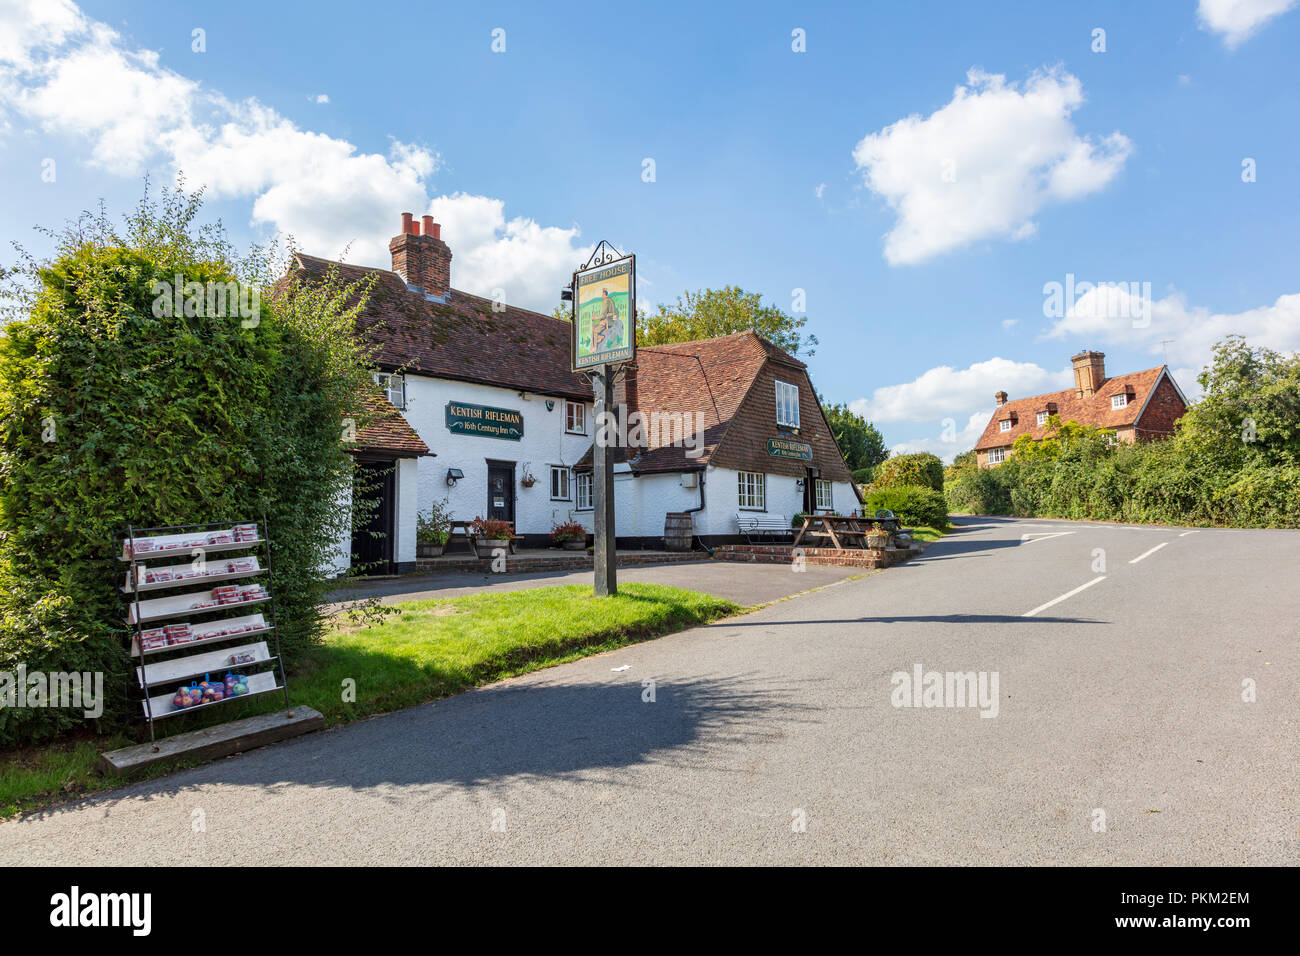 The historic 16th Century inn Kentish Rifleman, a traditional Free House pub in the Kent Village of Dunks Green near Tonbridge, Kent, UK Stock Photo